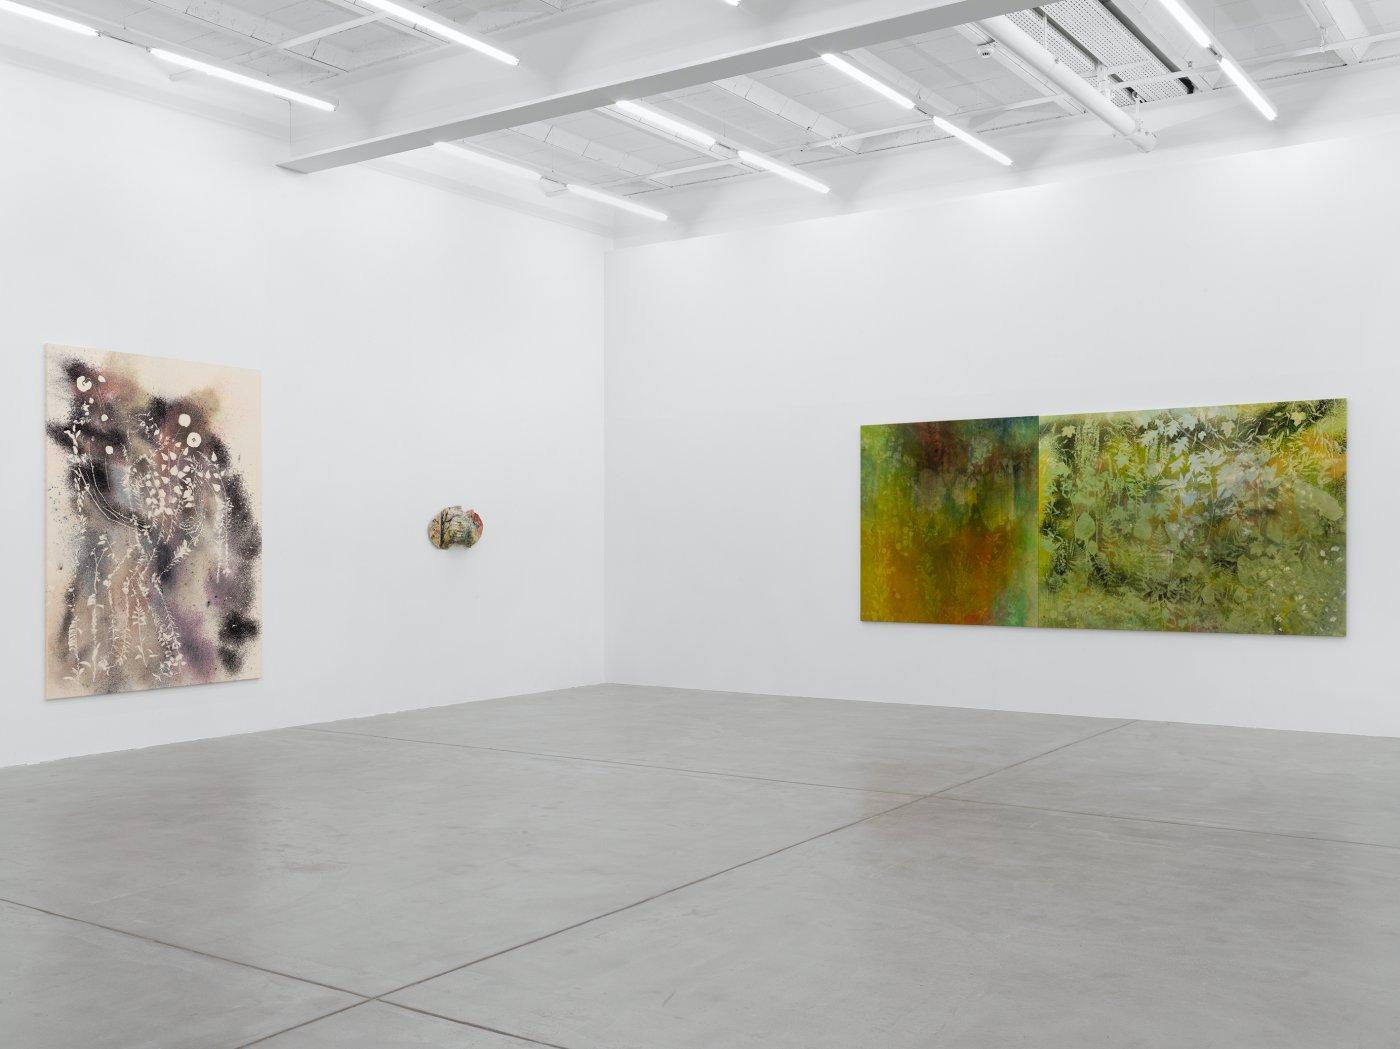 Galerie Eva Presenhuber Maag Areal Sam Falls 3